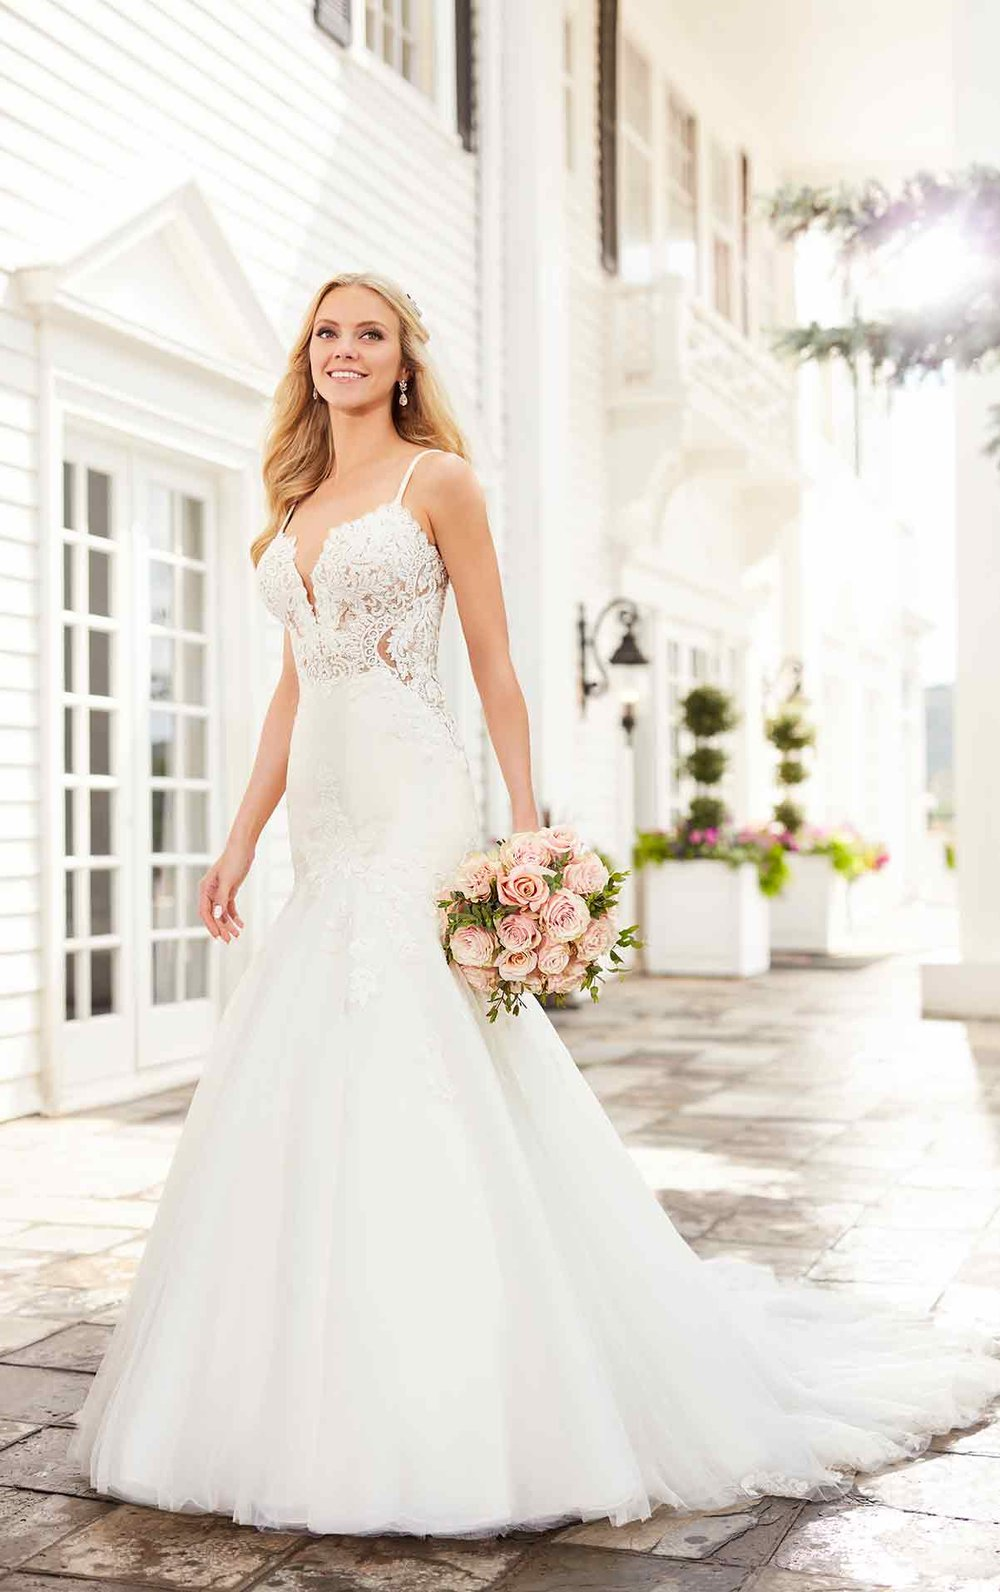 44f99fb4f09 Max Bridal NY - wedding dress boutique in Syosset